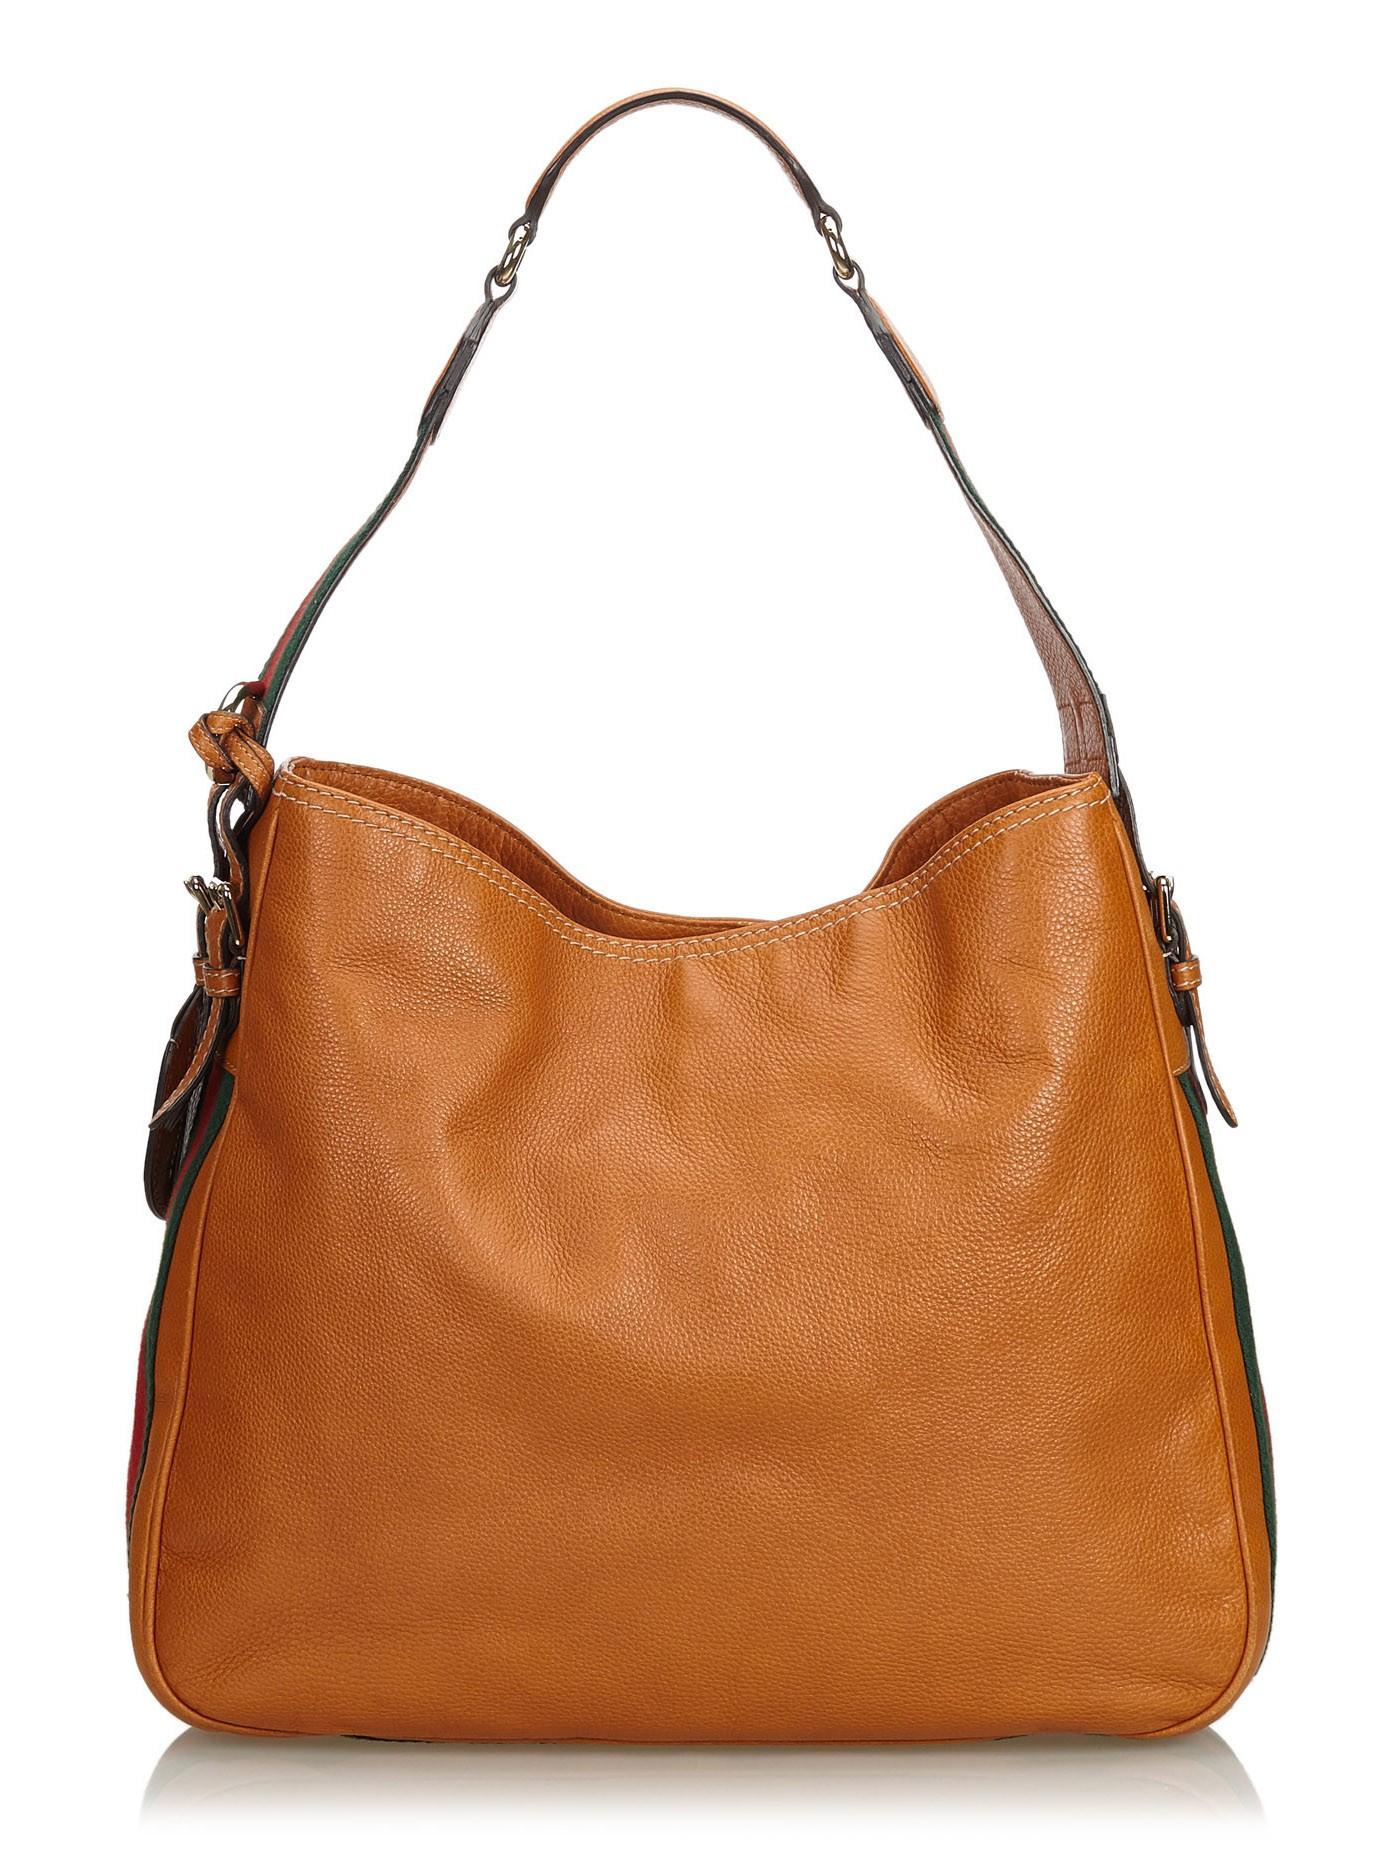 32090726591 Gucci Vintage - Web Leather Heritage Hobo Bag - Brown - Leather Handbag -  Luxury High Quality - Avvenice